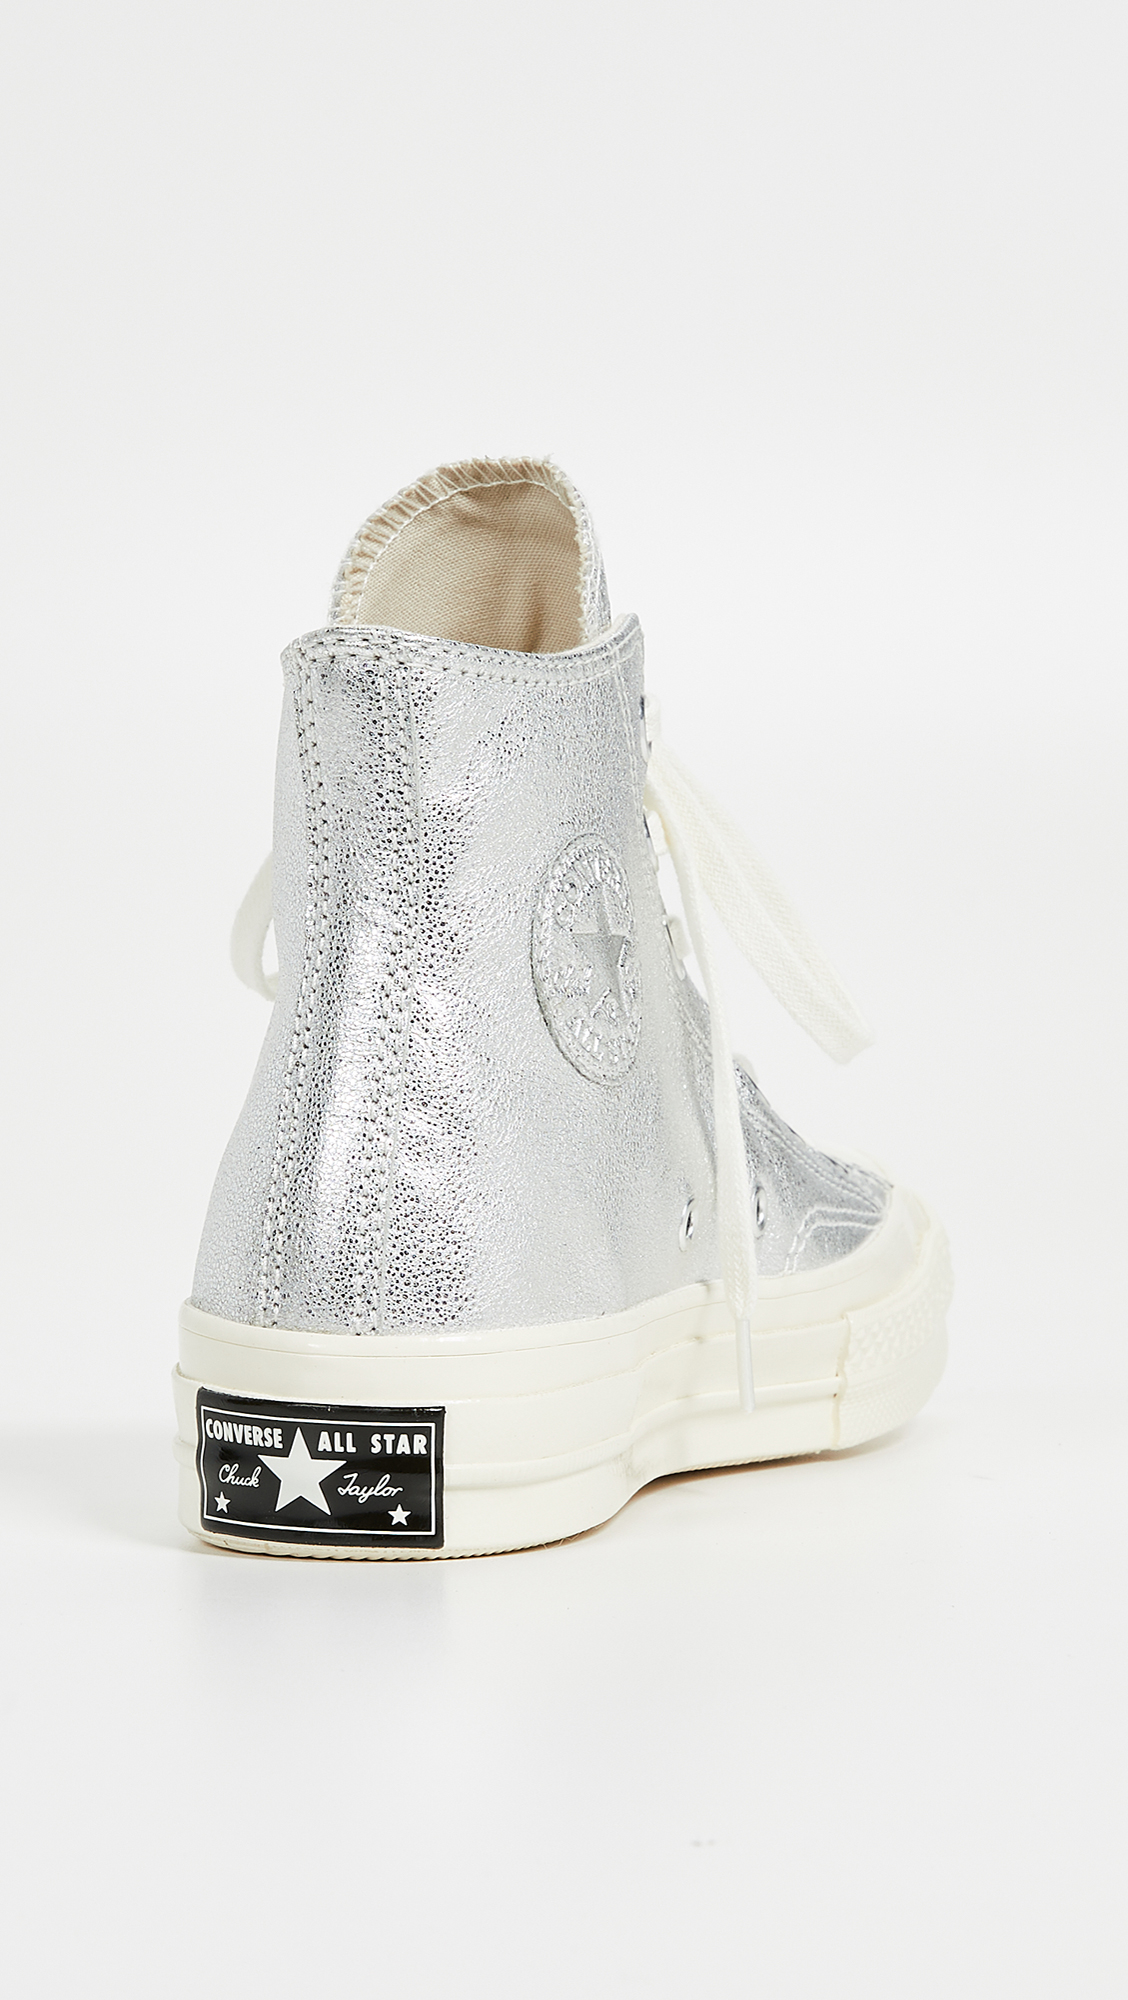 8d59a5cc8a89 Converse Chuck 70s High Top Heavy Metal Sneakers